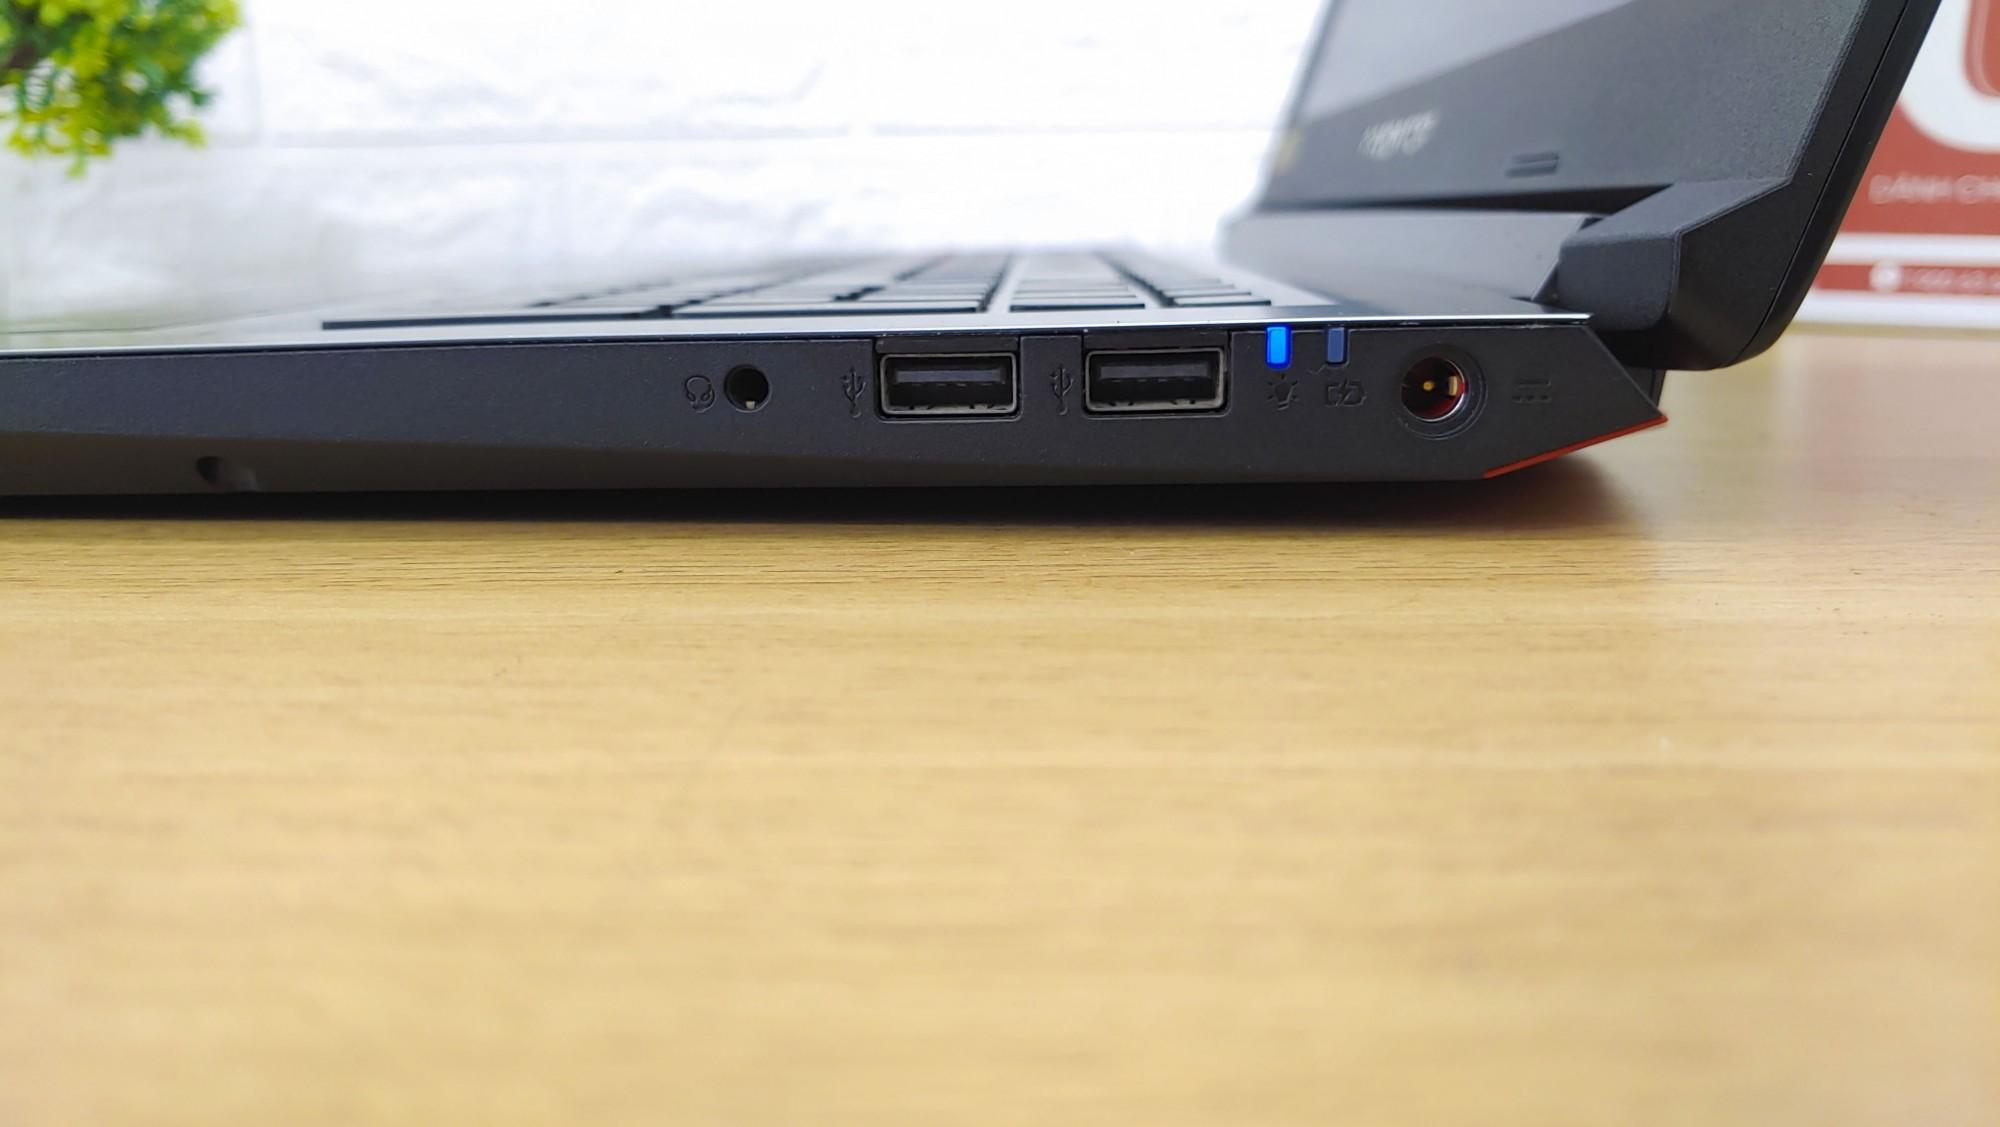 Acer Predator G3-572